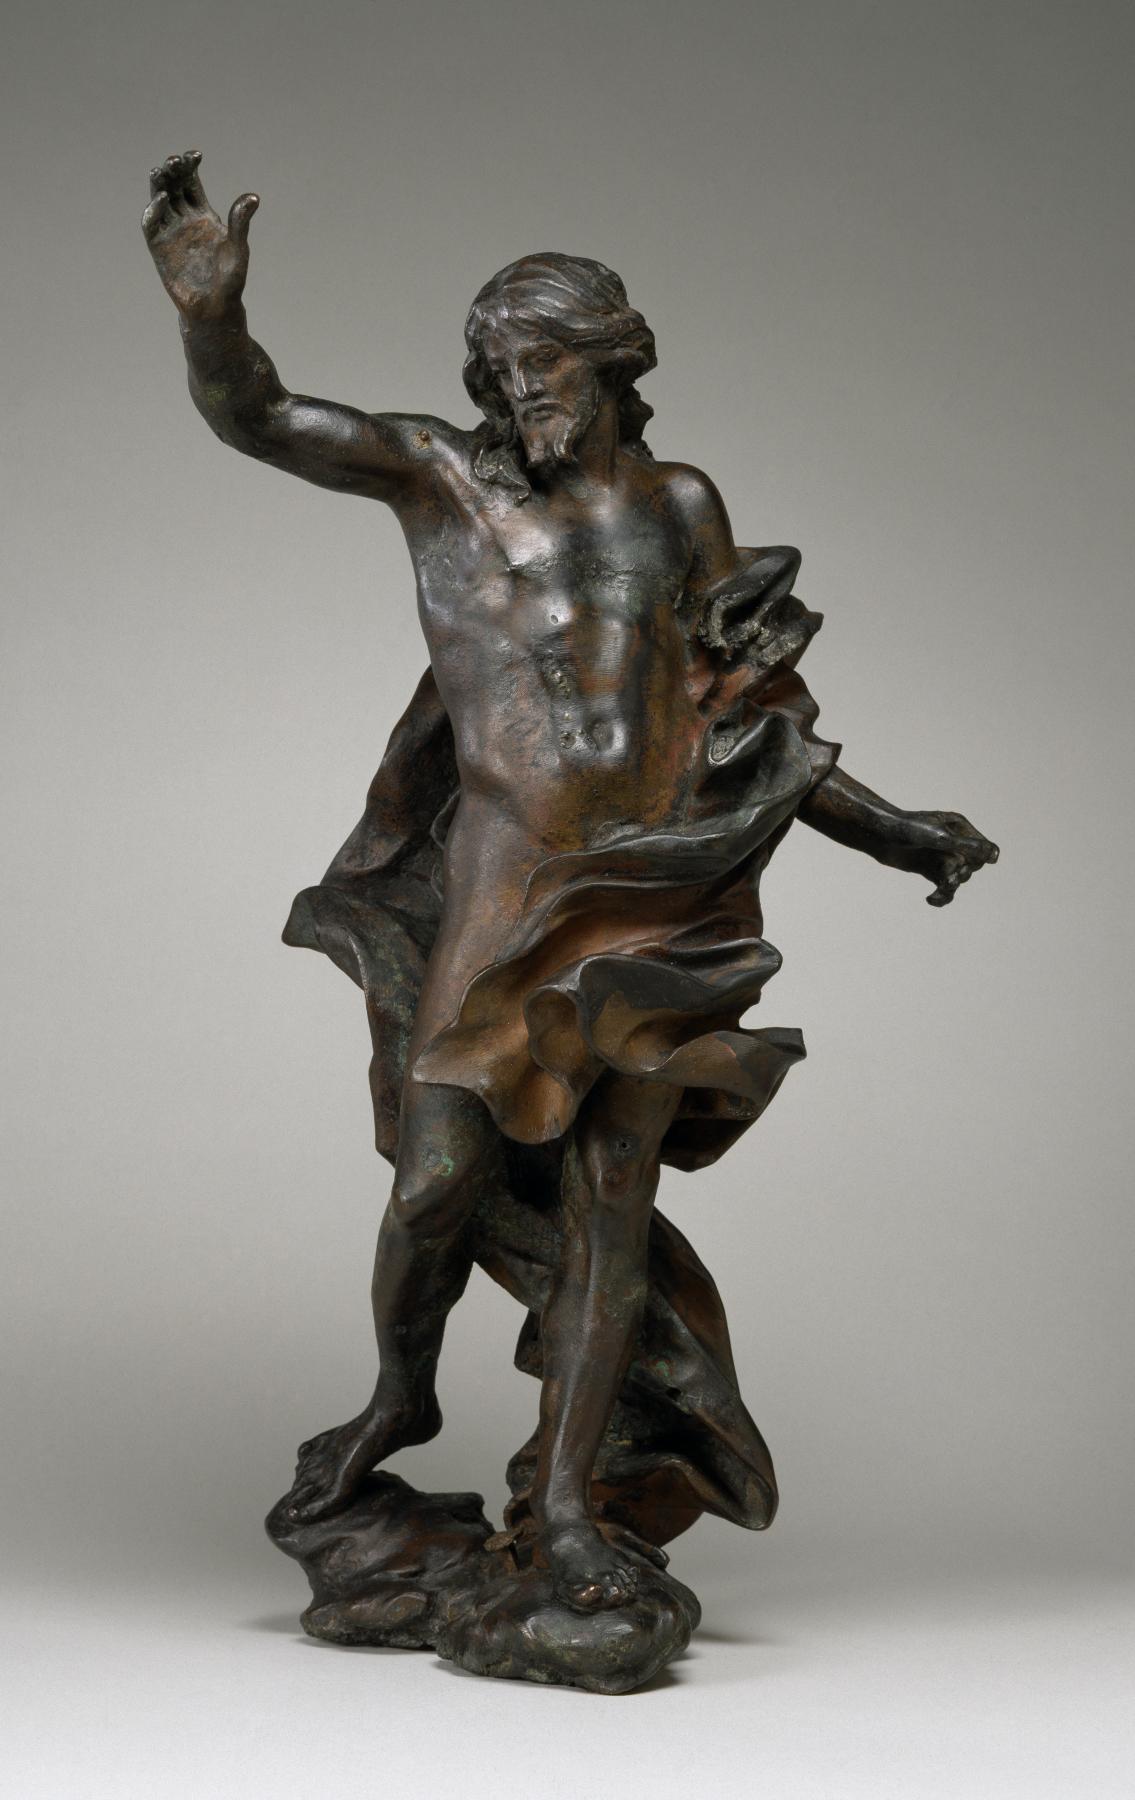 Giovanni Lorenzo Bernini Workshop_of_Gian_Lorenzo_Bernini_-_The_Risen_Christ_-_Walters_542281